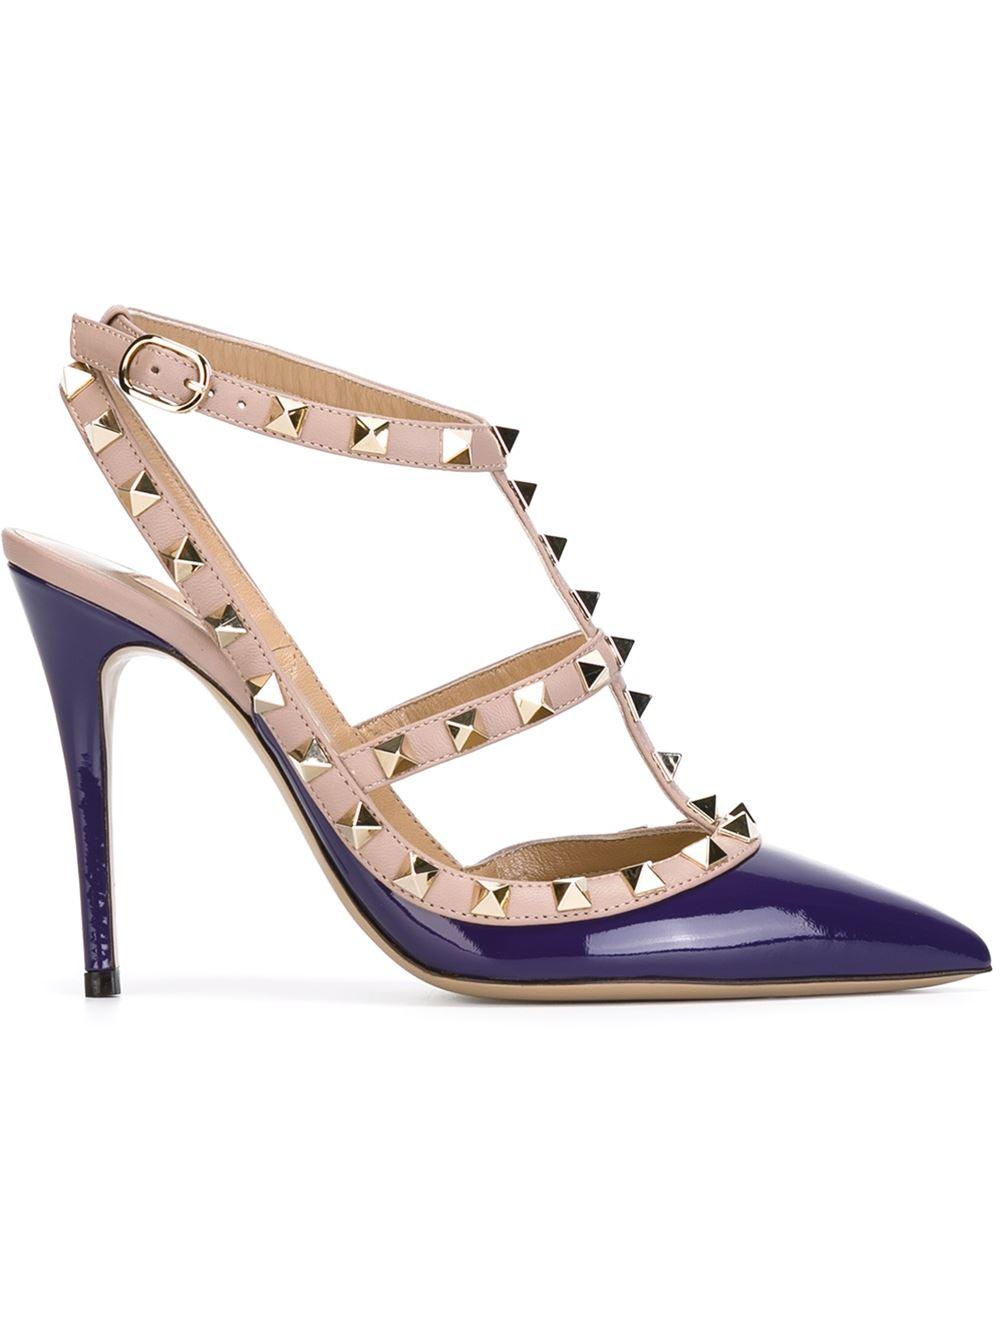 valentino 39 rockstud 39 pumps in purple pink purple lyst. Black Bedroom Furniture Sets. Home Design Ideas